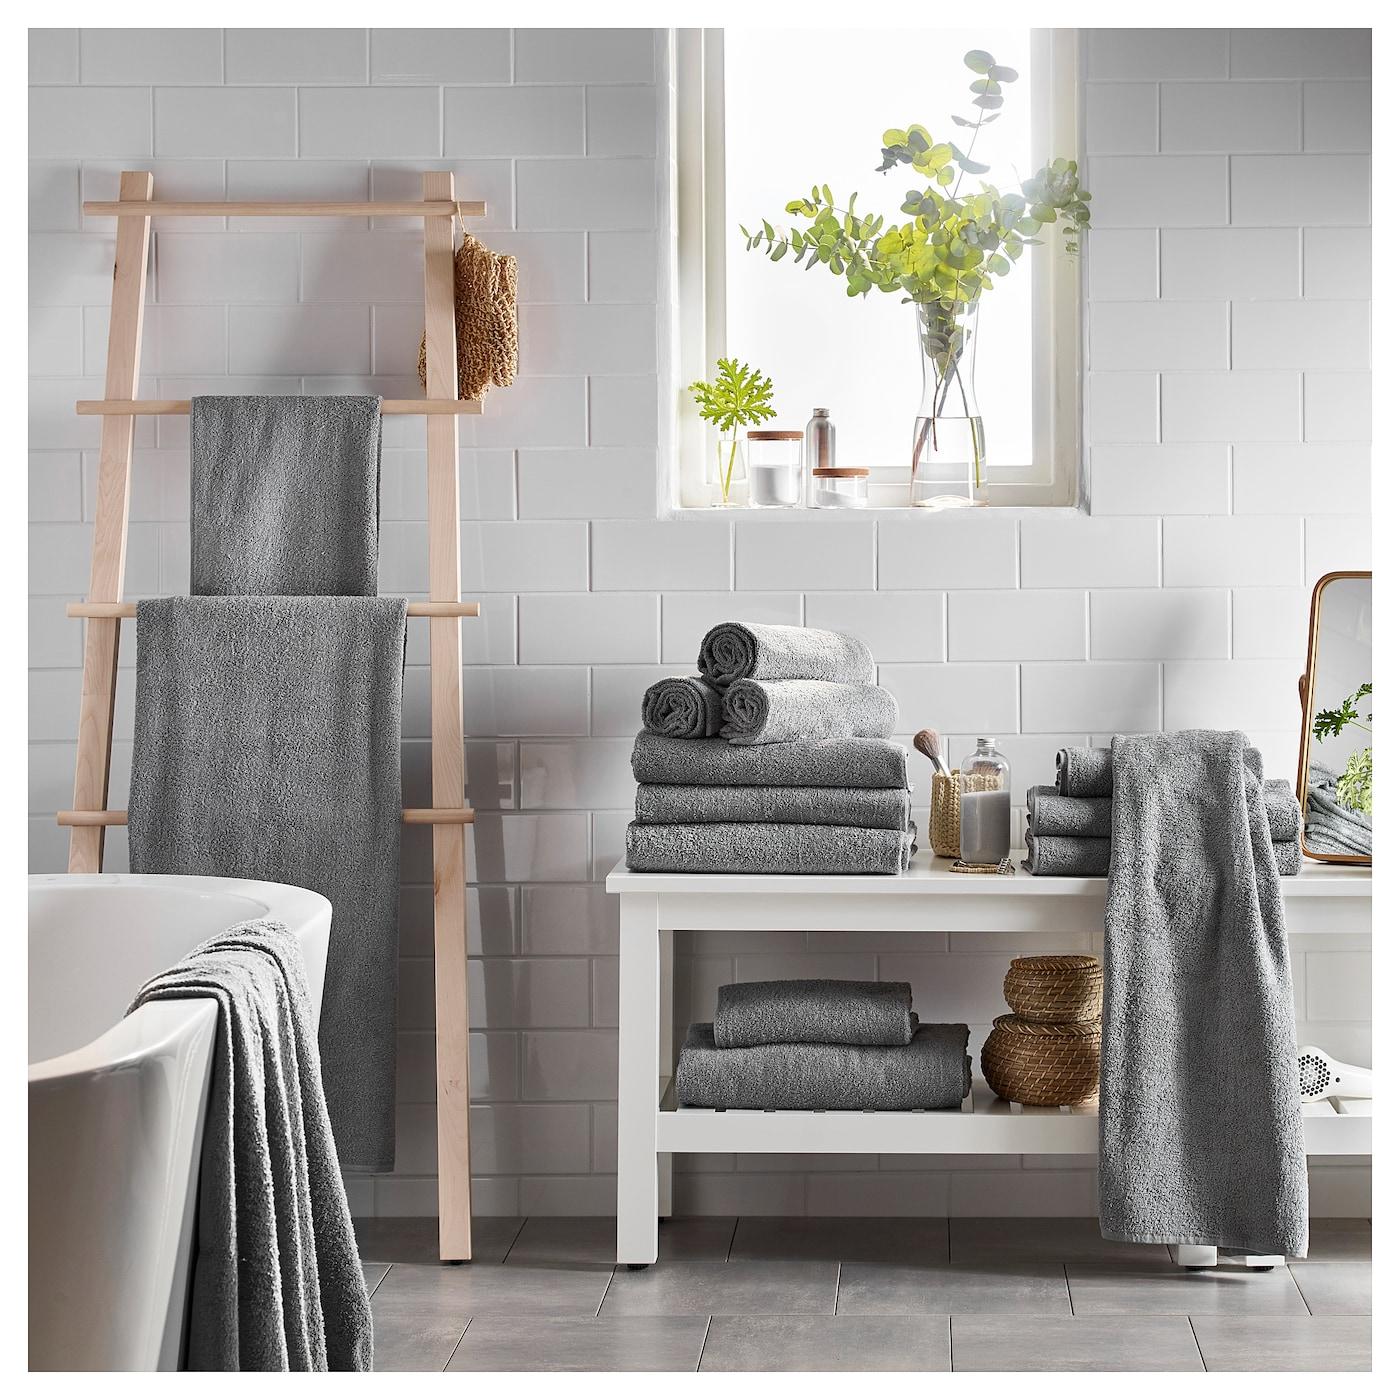 h ren drap de bain gris moyen 100 x 150 cm ikea. Black Bedroom Furniture Sets. Home Design Ideas